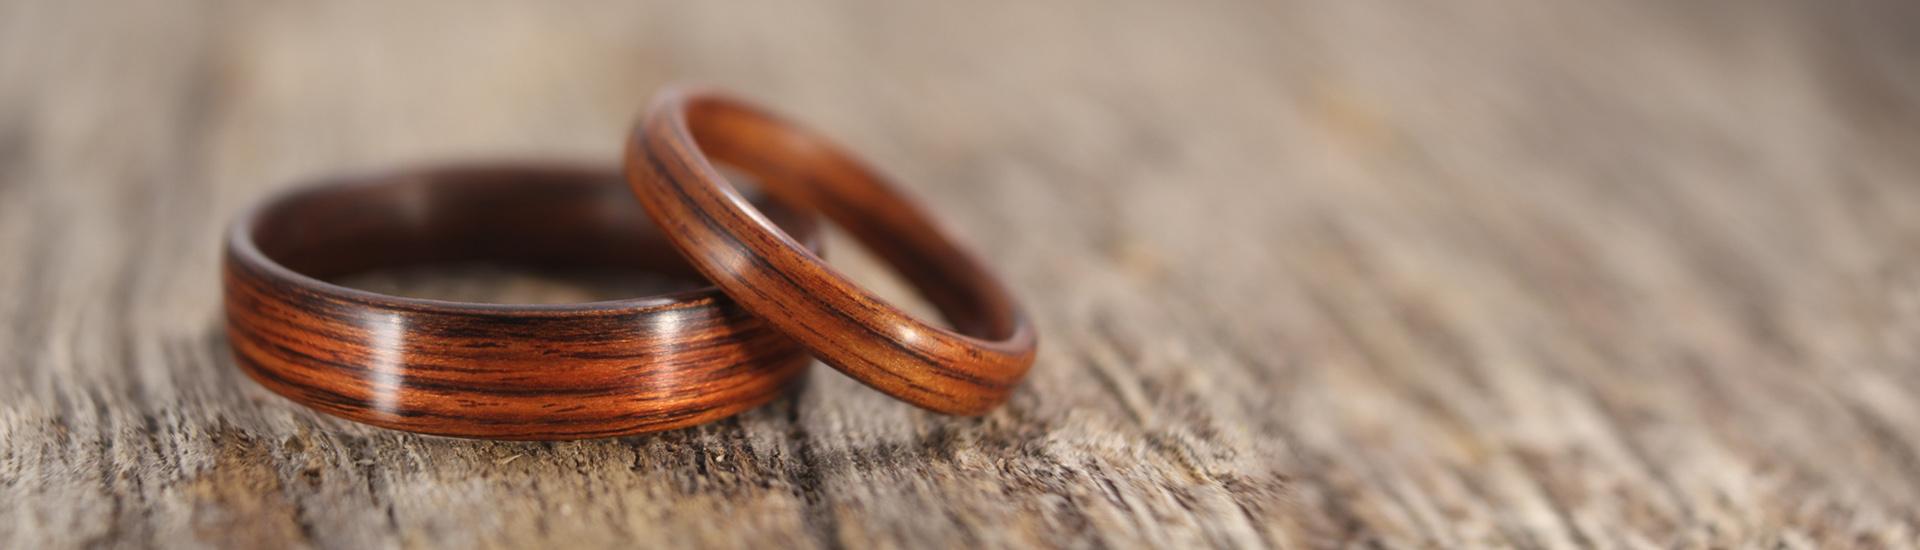 main-page-kingwood-bentwood-ring-pair2